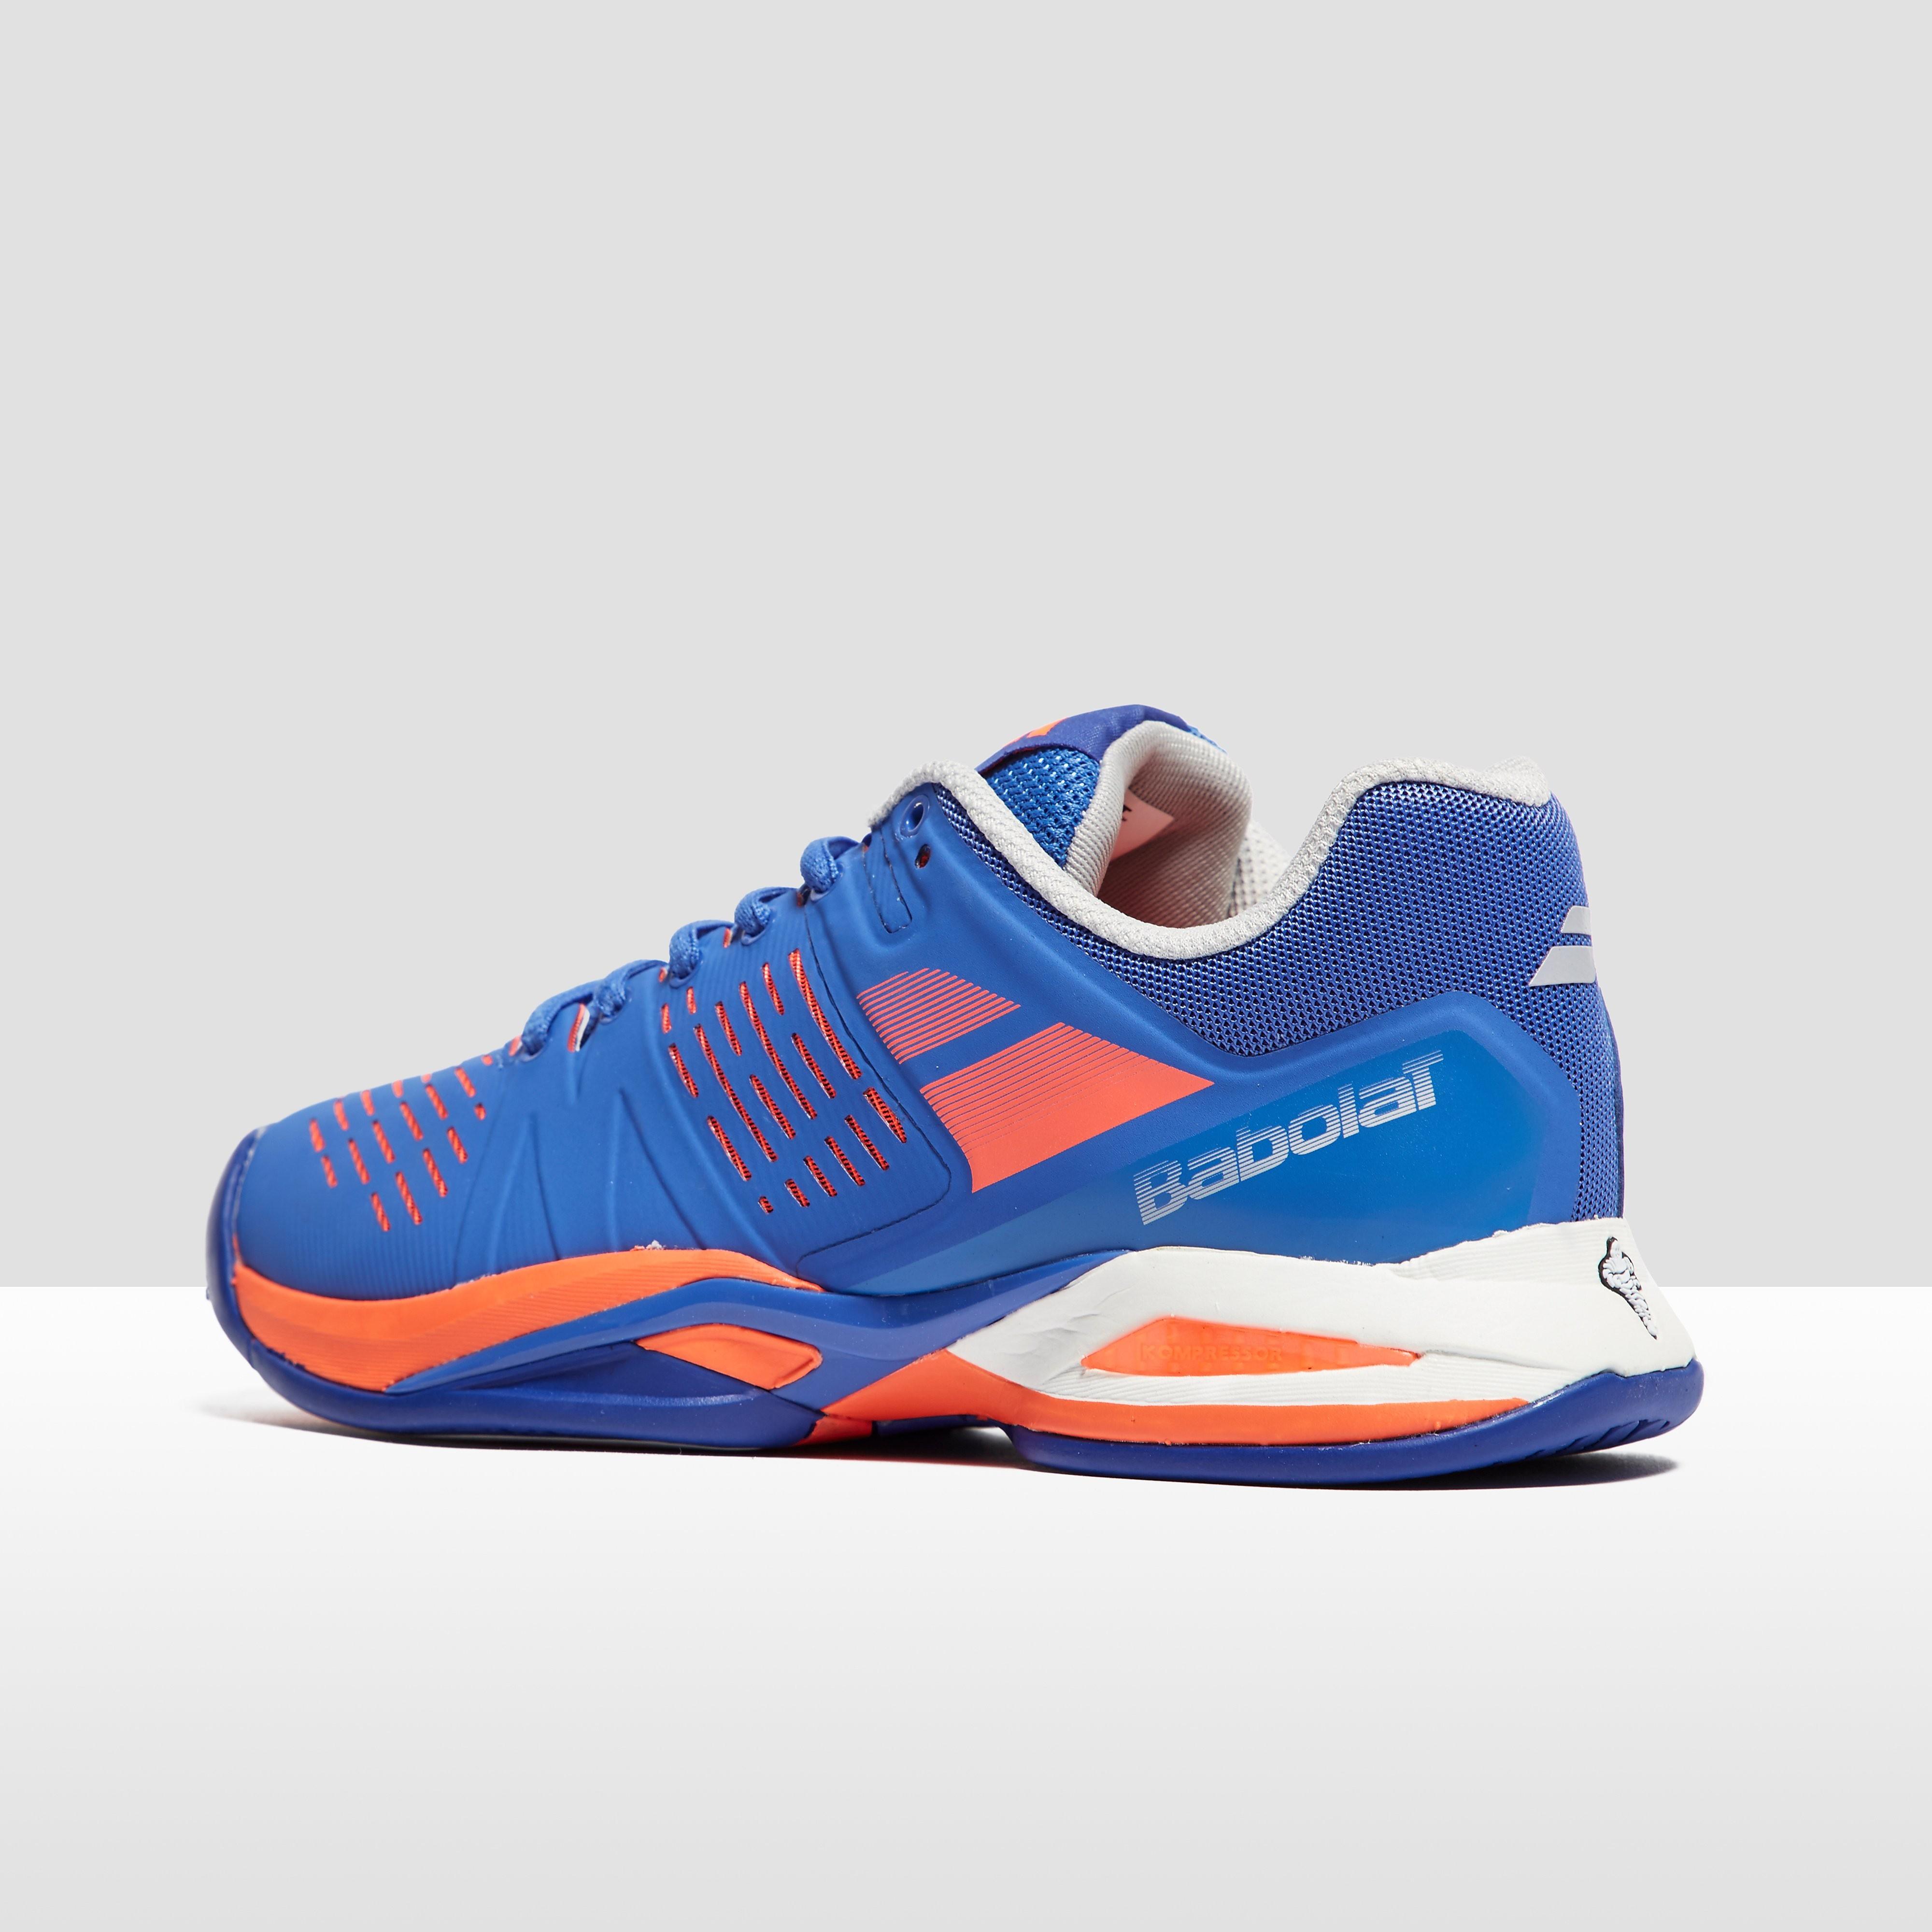 Babolat Propulse Team All- Court Women's Tennis Shoes